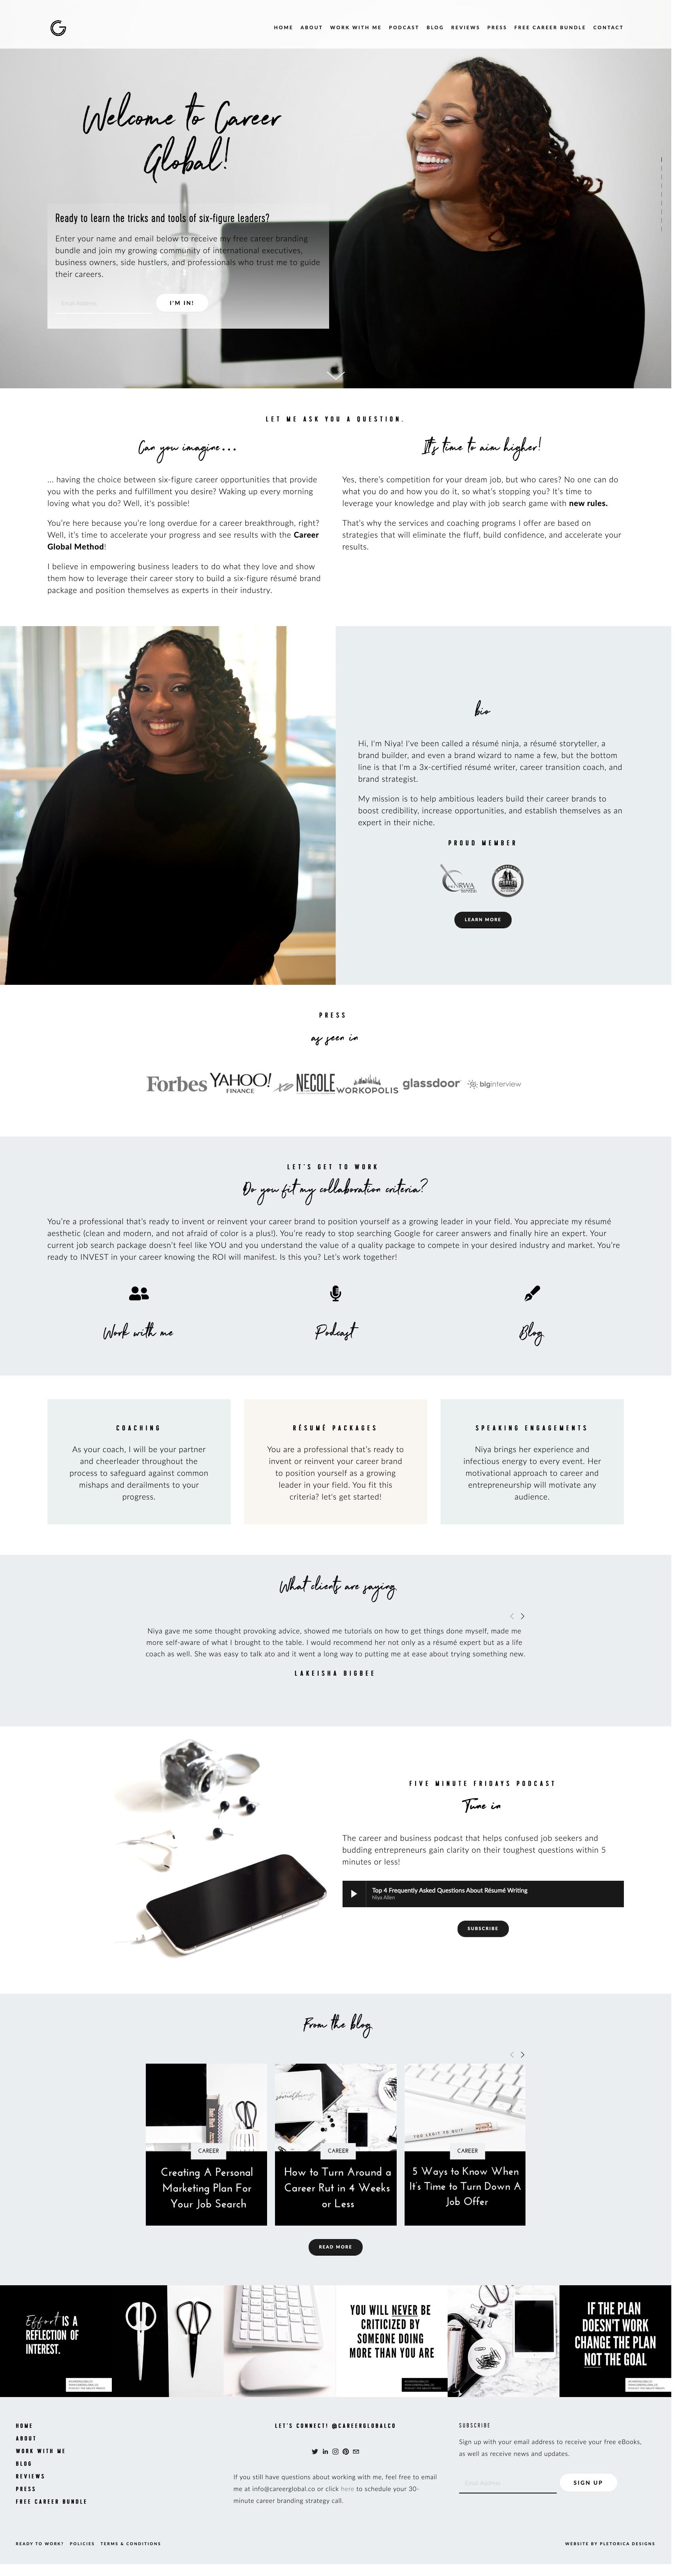 Career Global Squarespace Website — PLETÓRICA DESIGNS